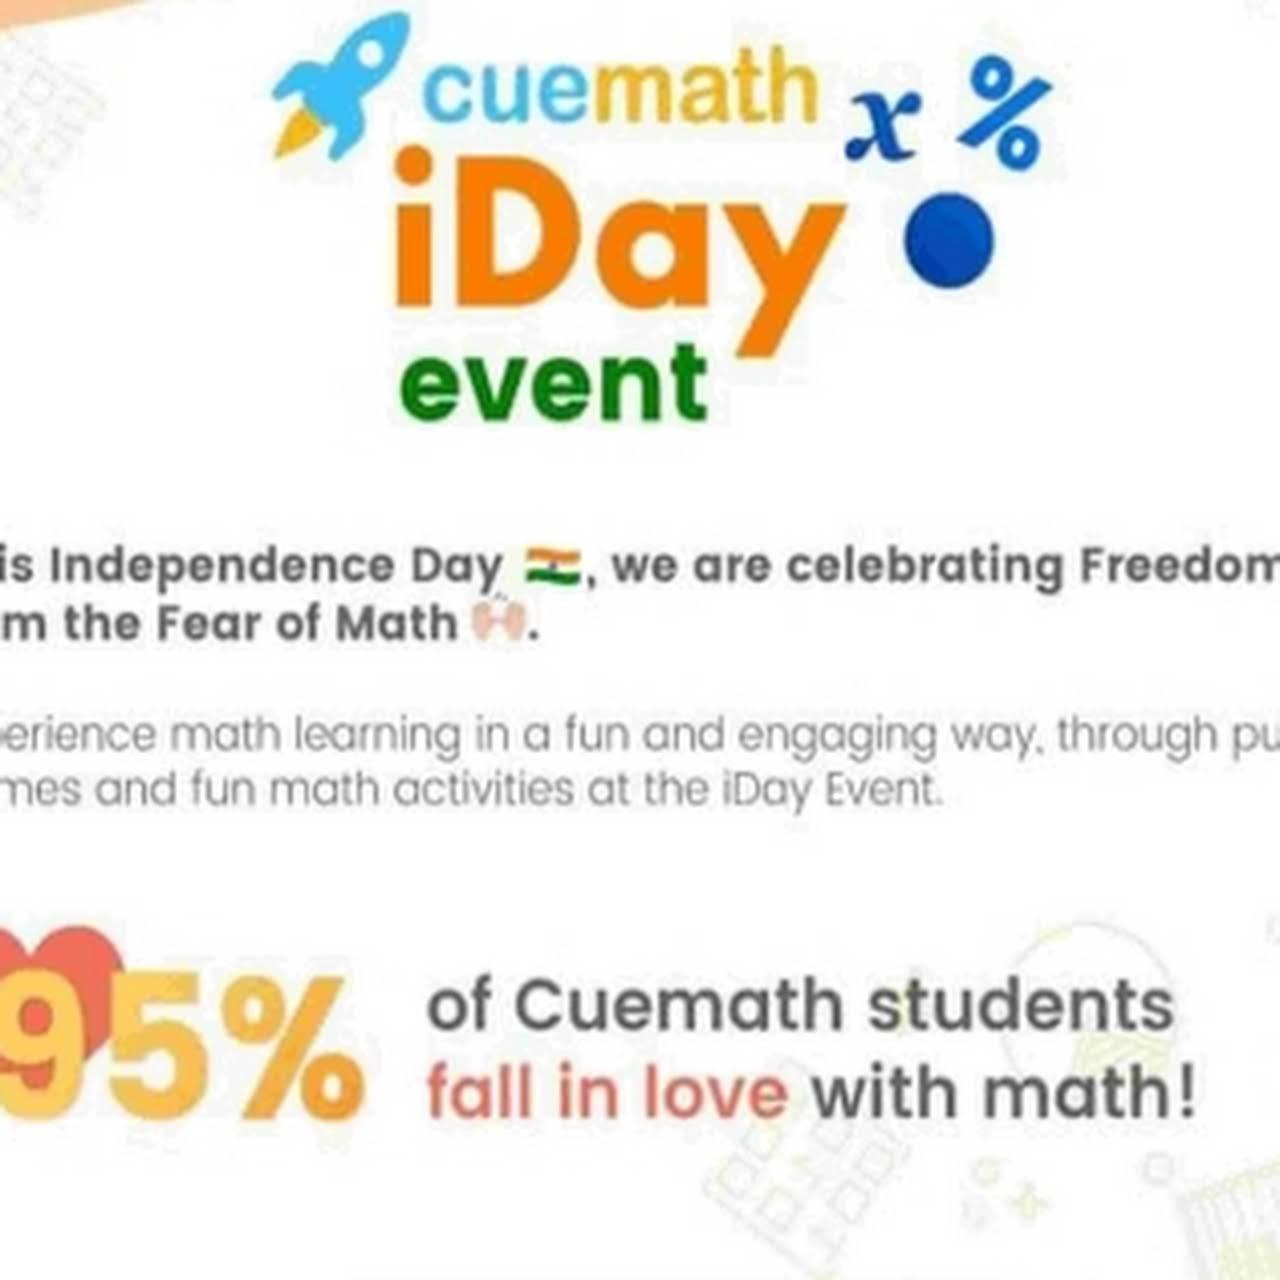 CUEMATH Math Learning Centre - Math Learning Beyond School